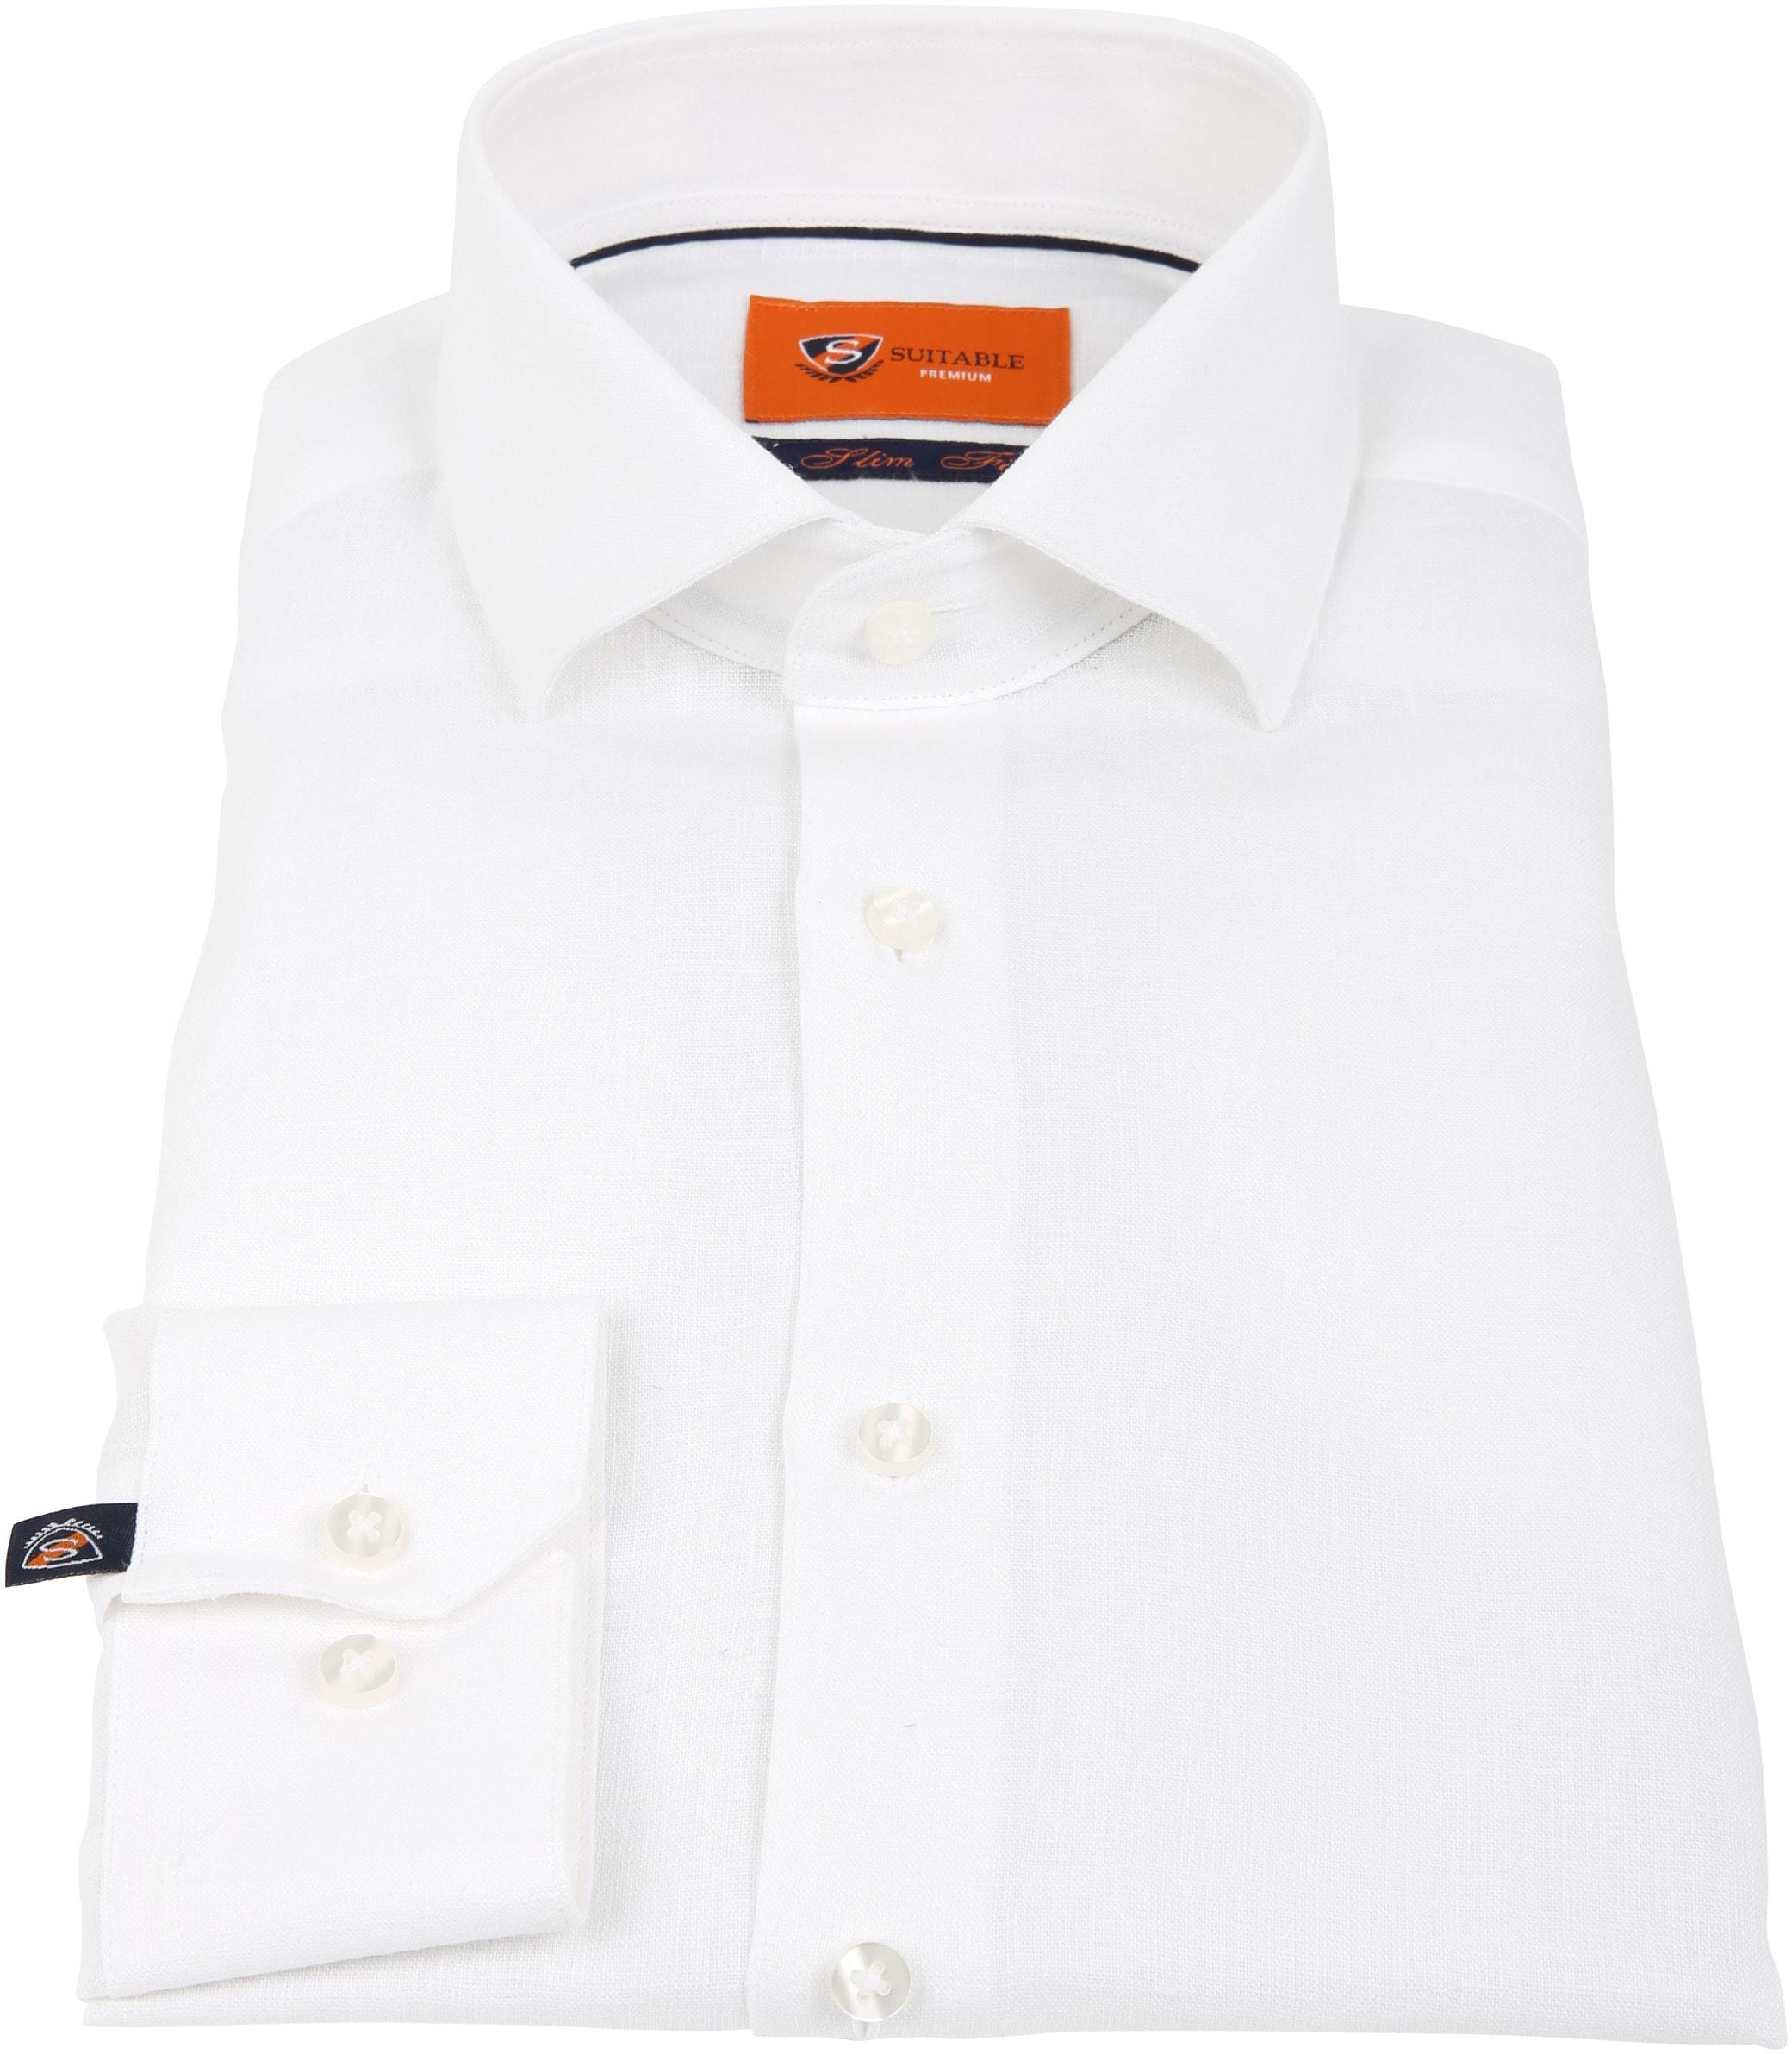 Suitable Hemd Leinen Weiß D81-13 foto 2